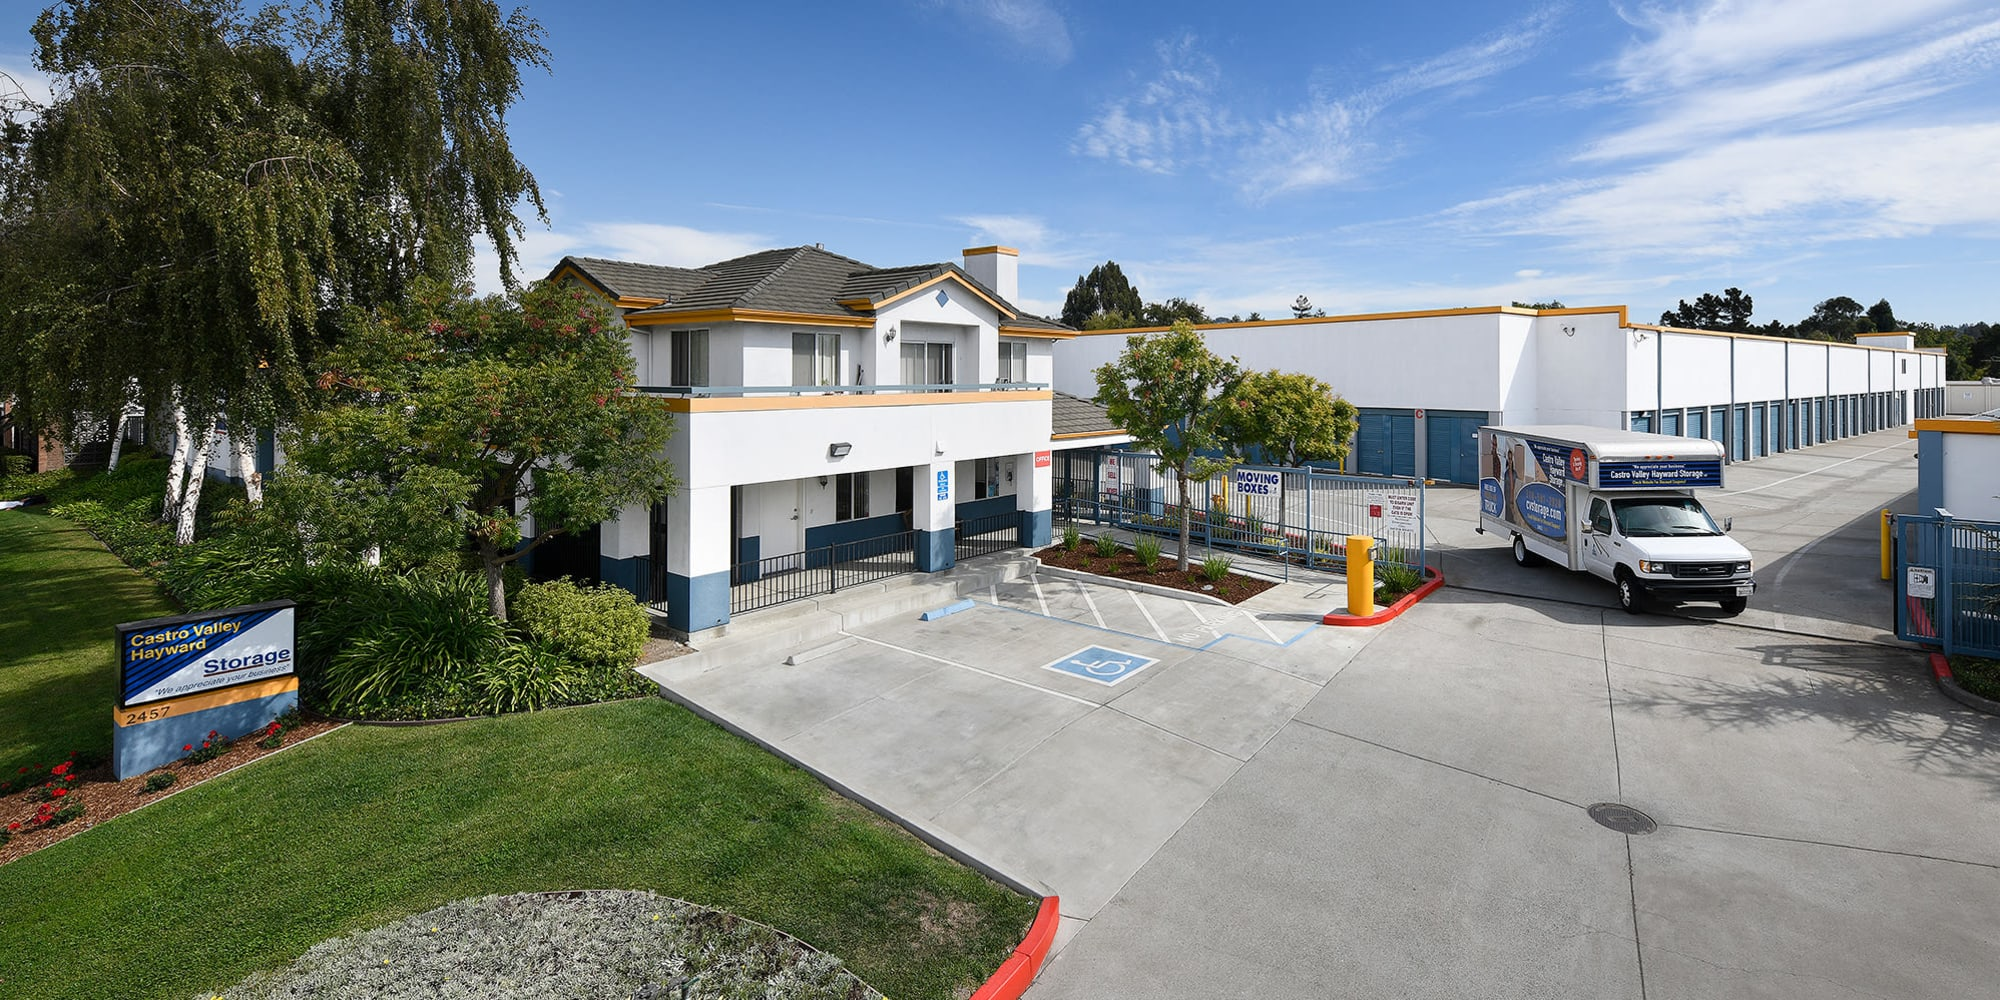 Outside view of Castro Valley Hayward Storage LLC in Castro Valley, California